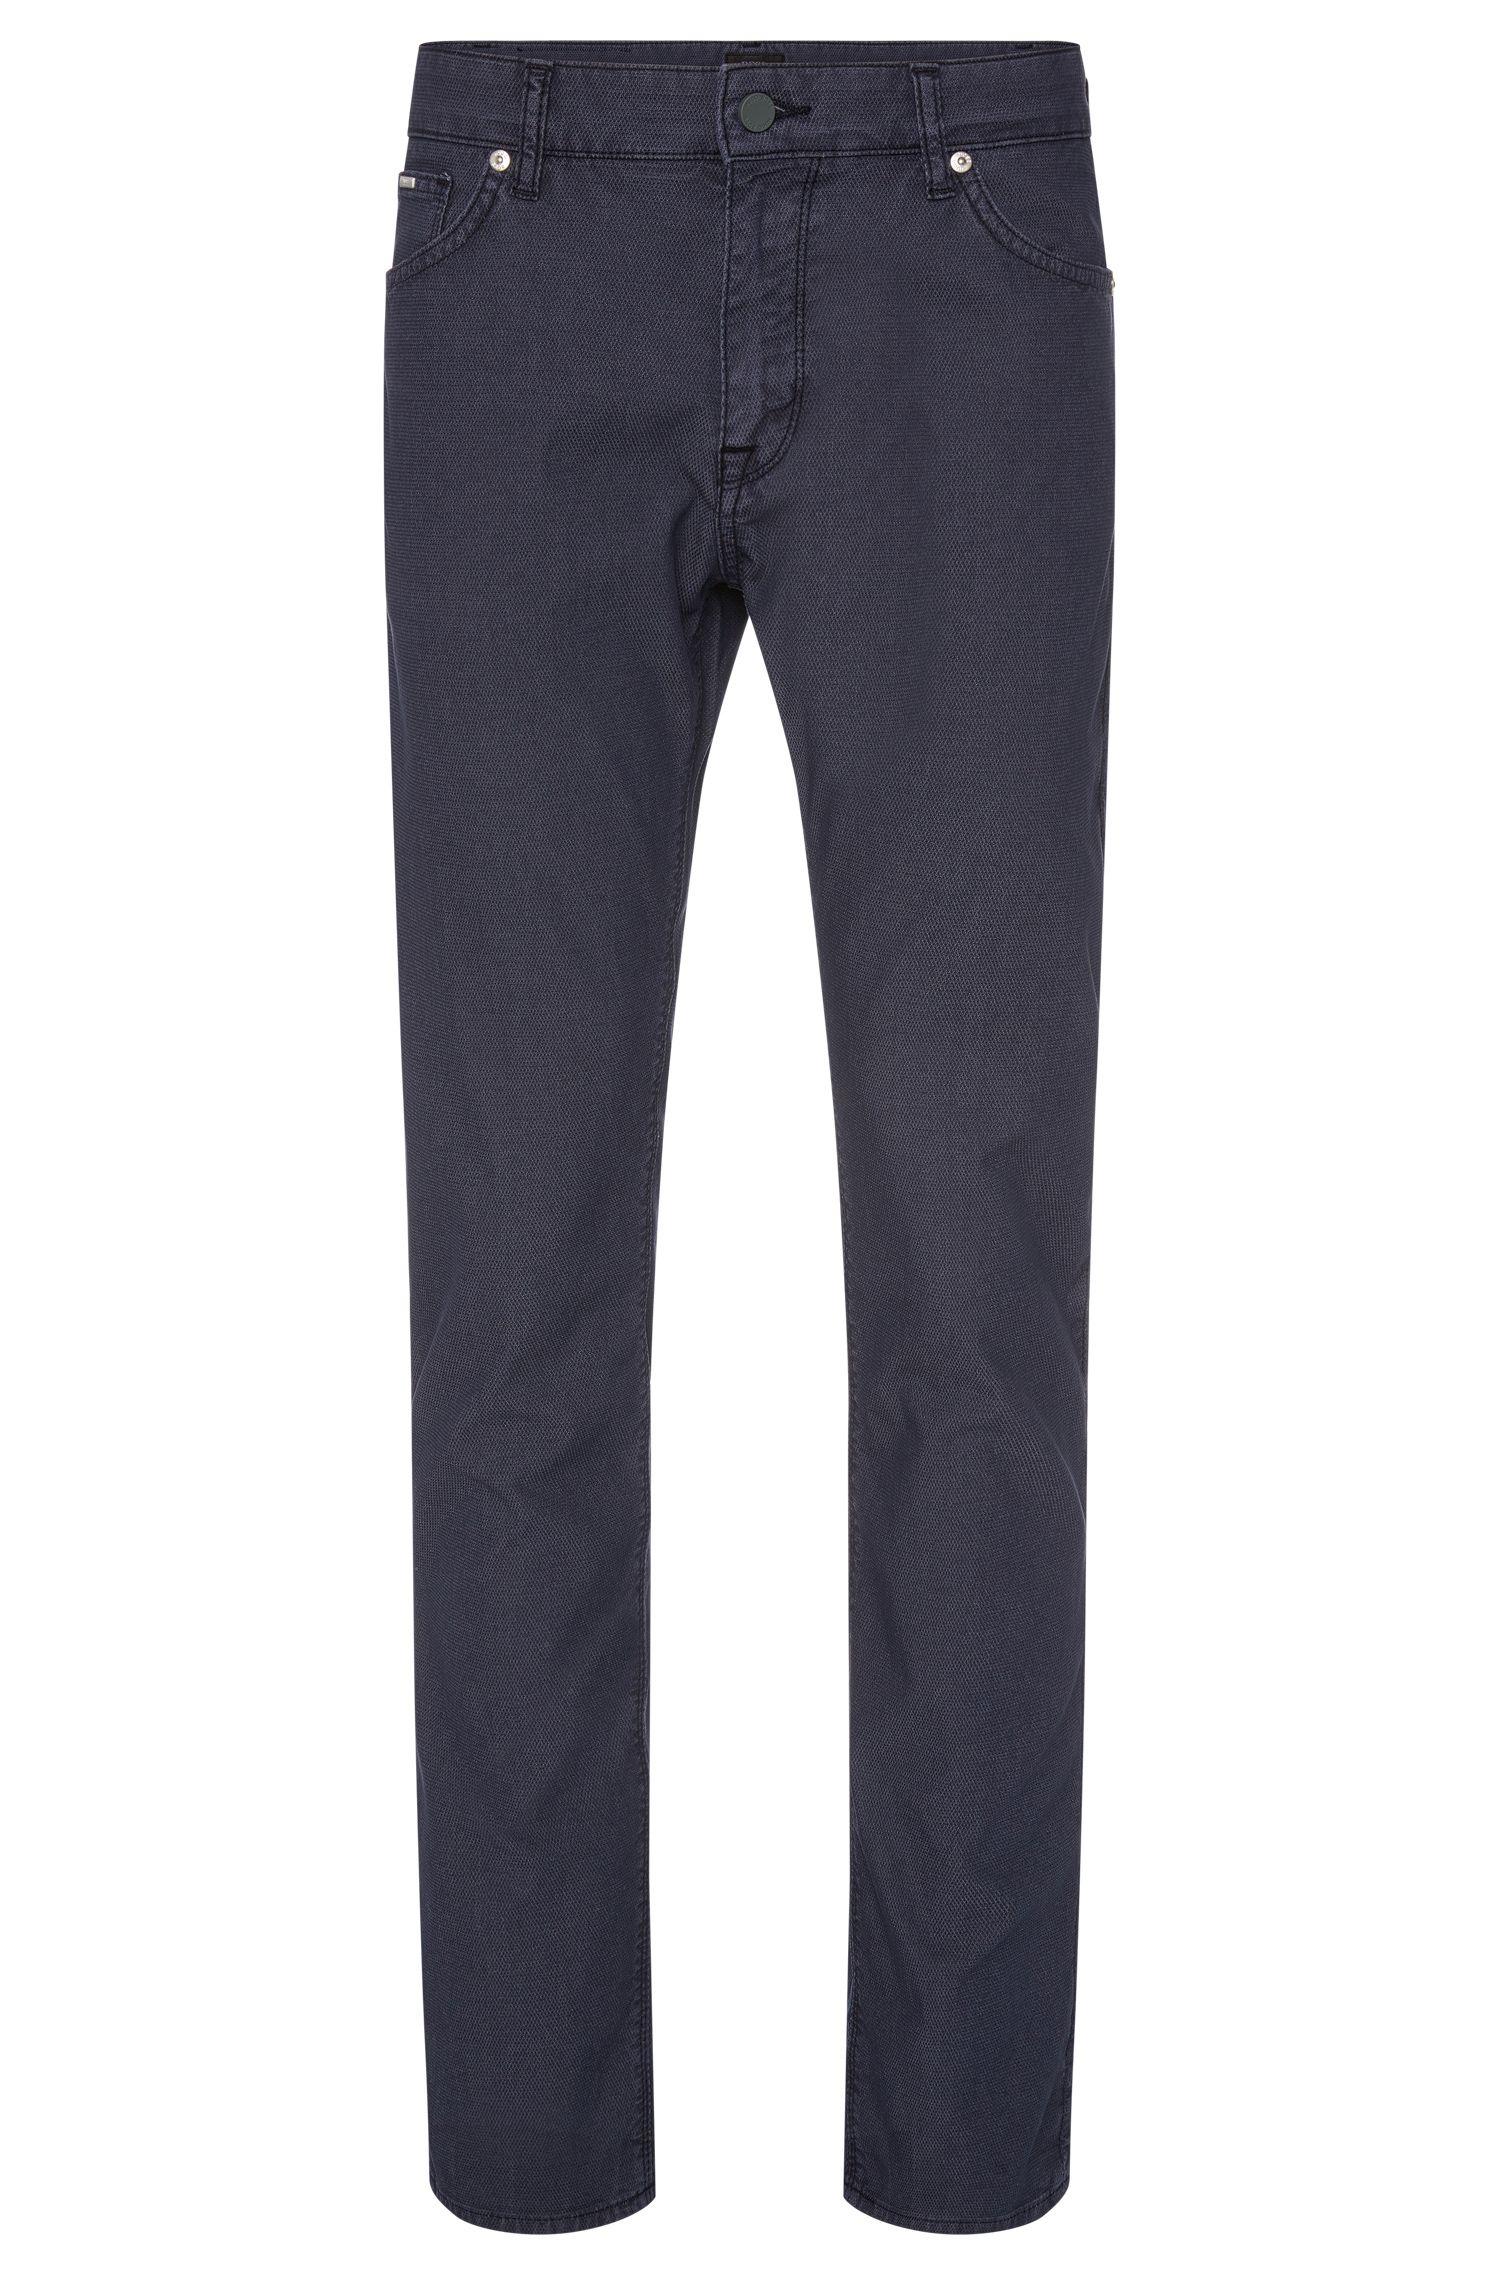 'Maine' | Regular Fit, Stretch Cotton Blend Birdseye Trousers